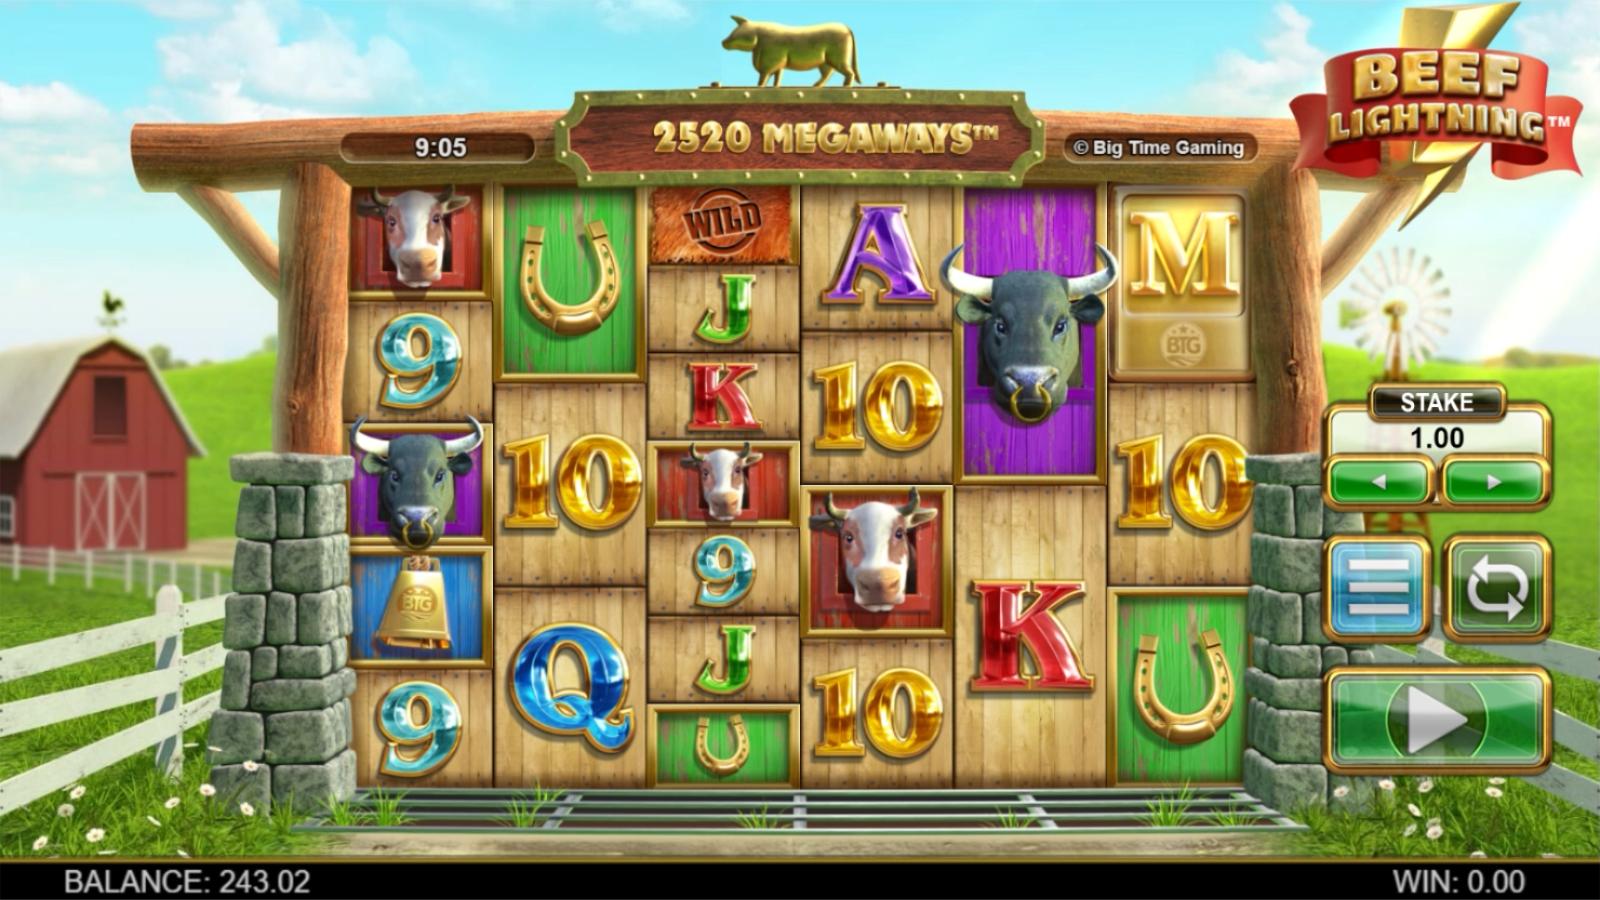 Beef Lightning Megaways slot screenshot